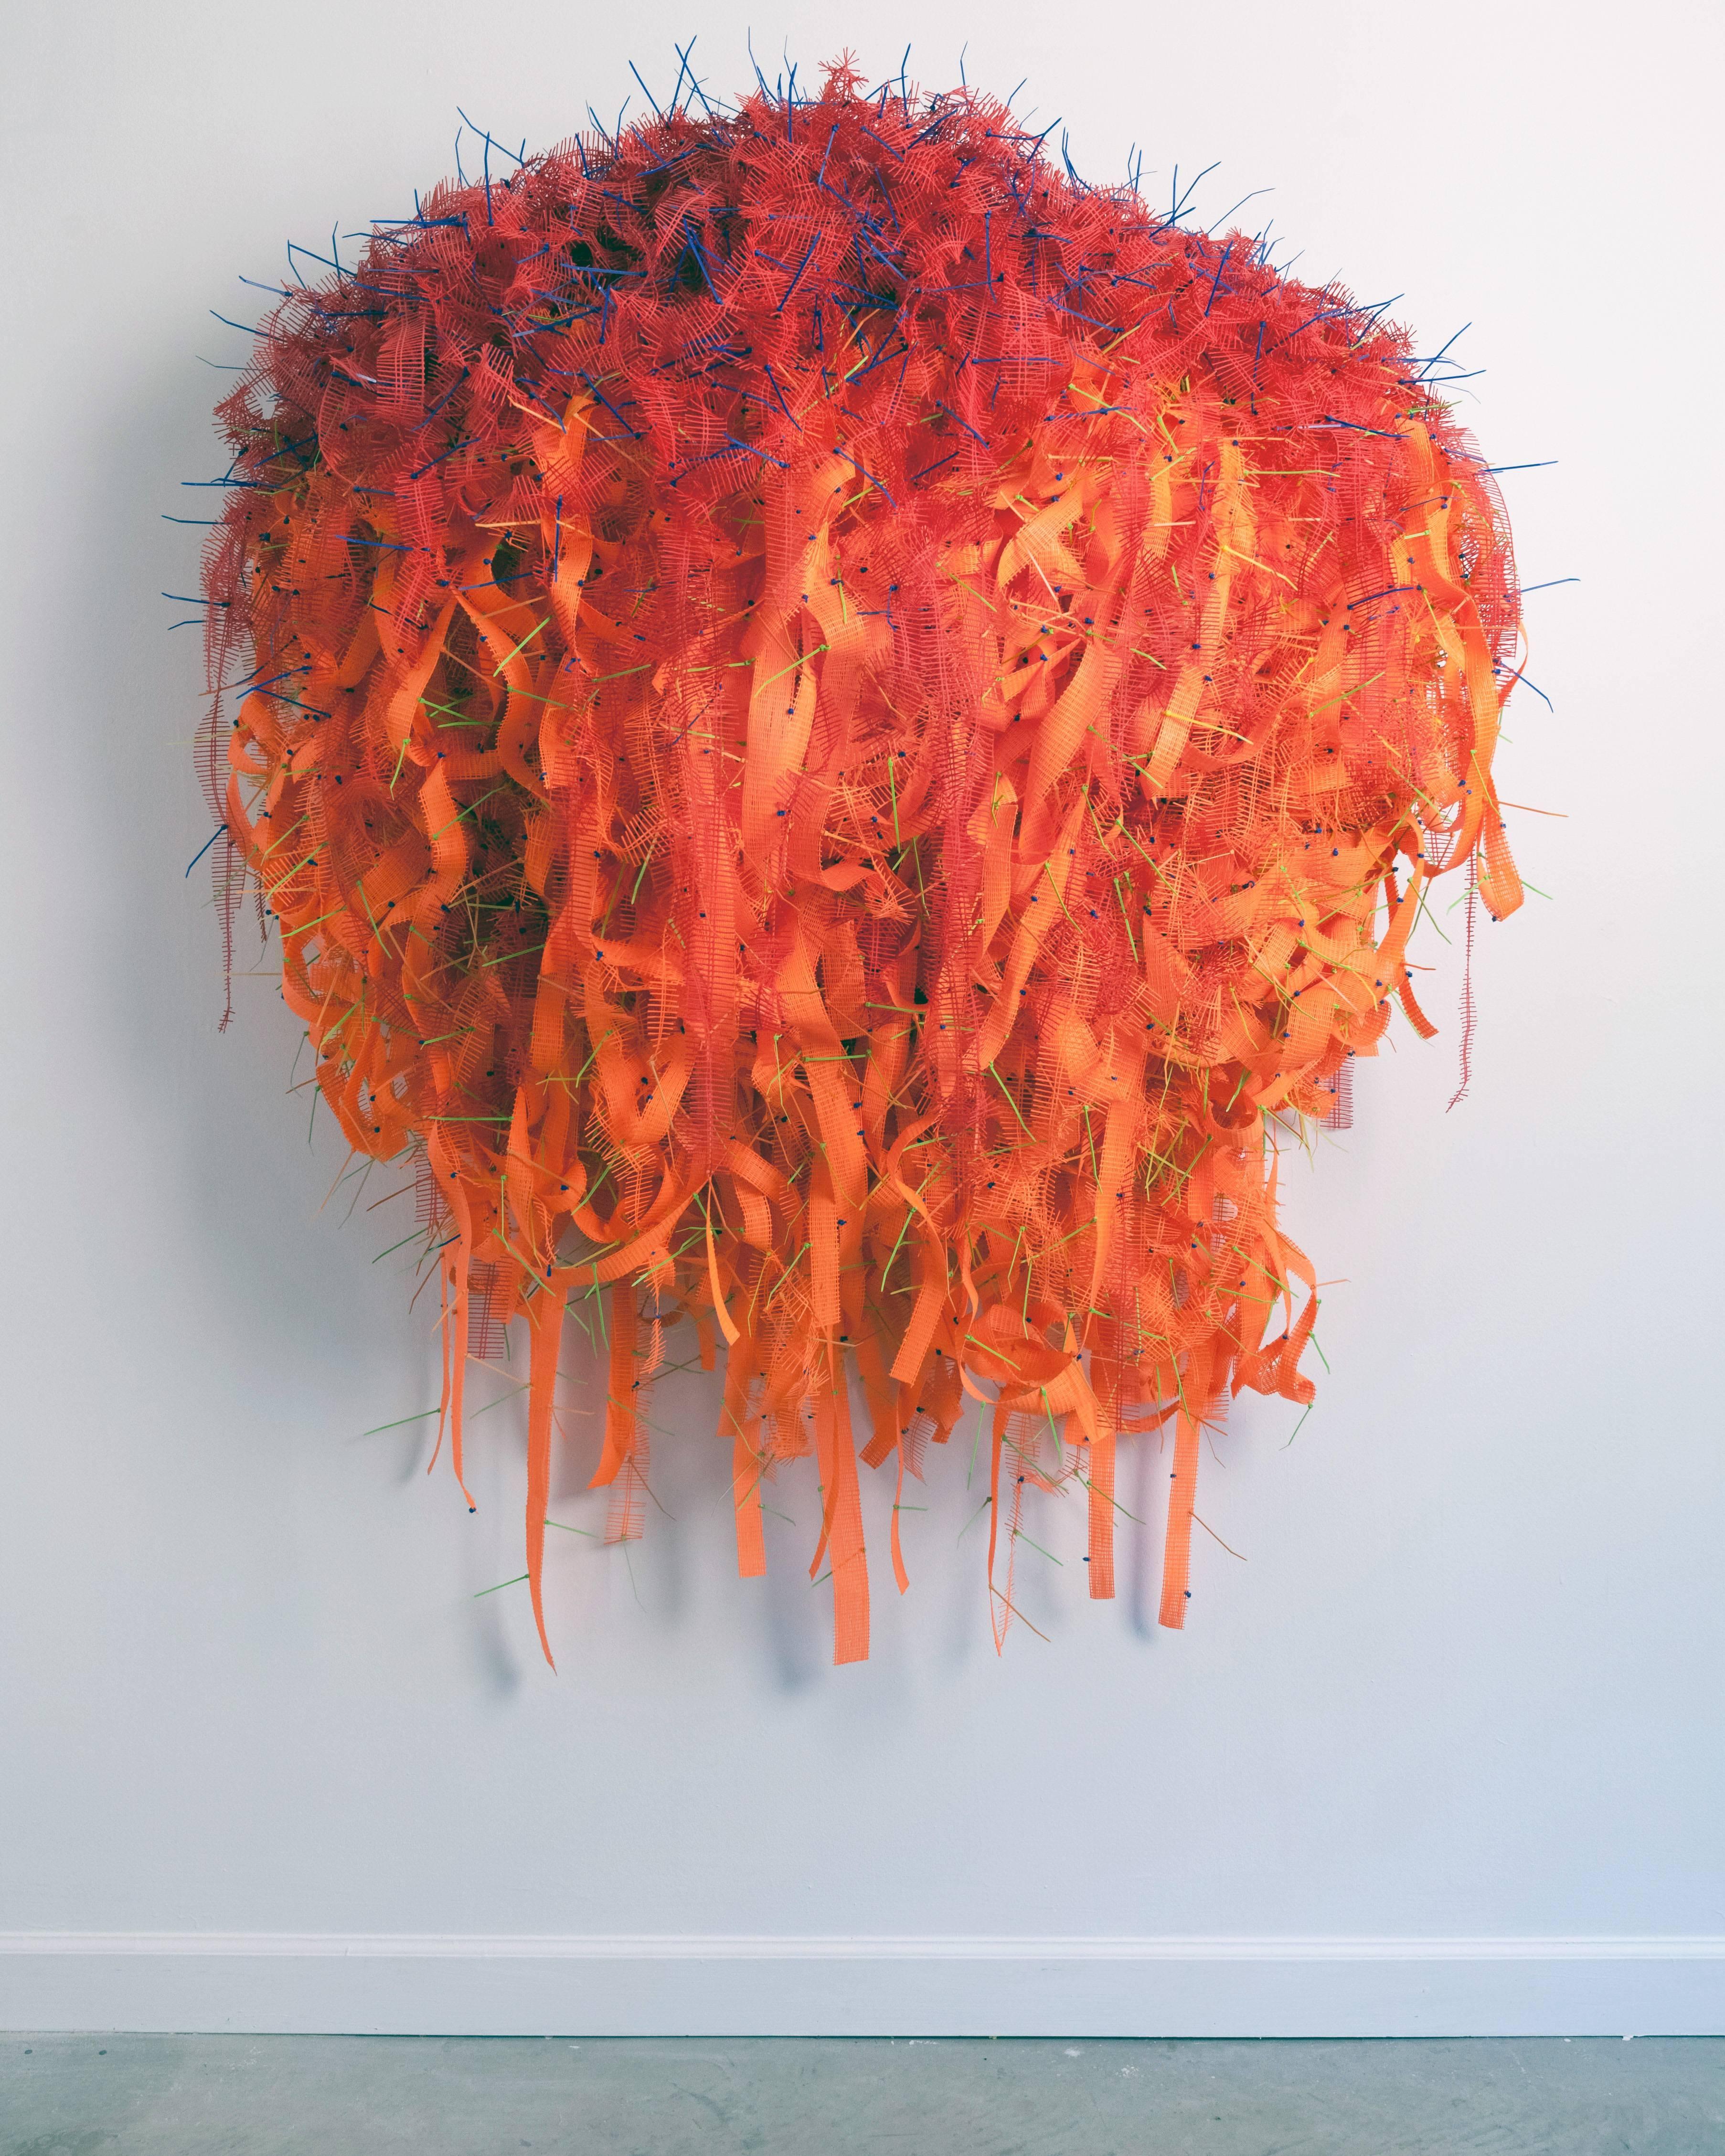 Joseph Fucigna, Burning Bush, 2001, Plastic, Found Objects